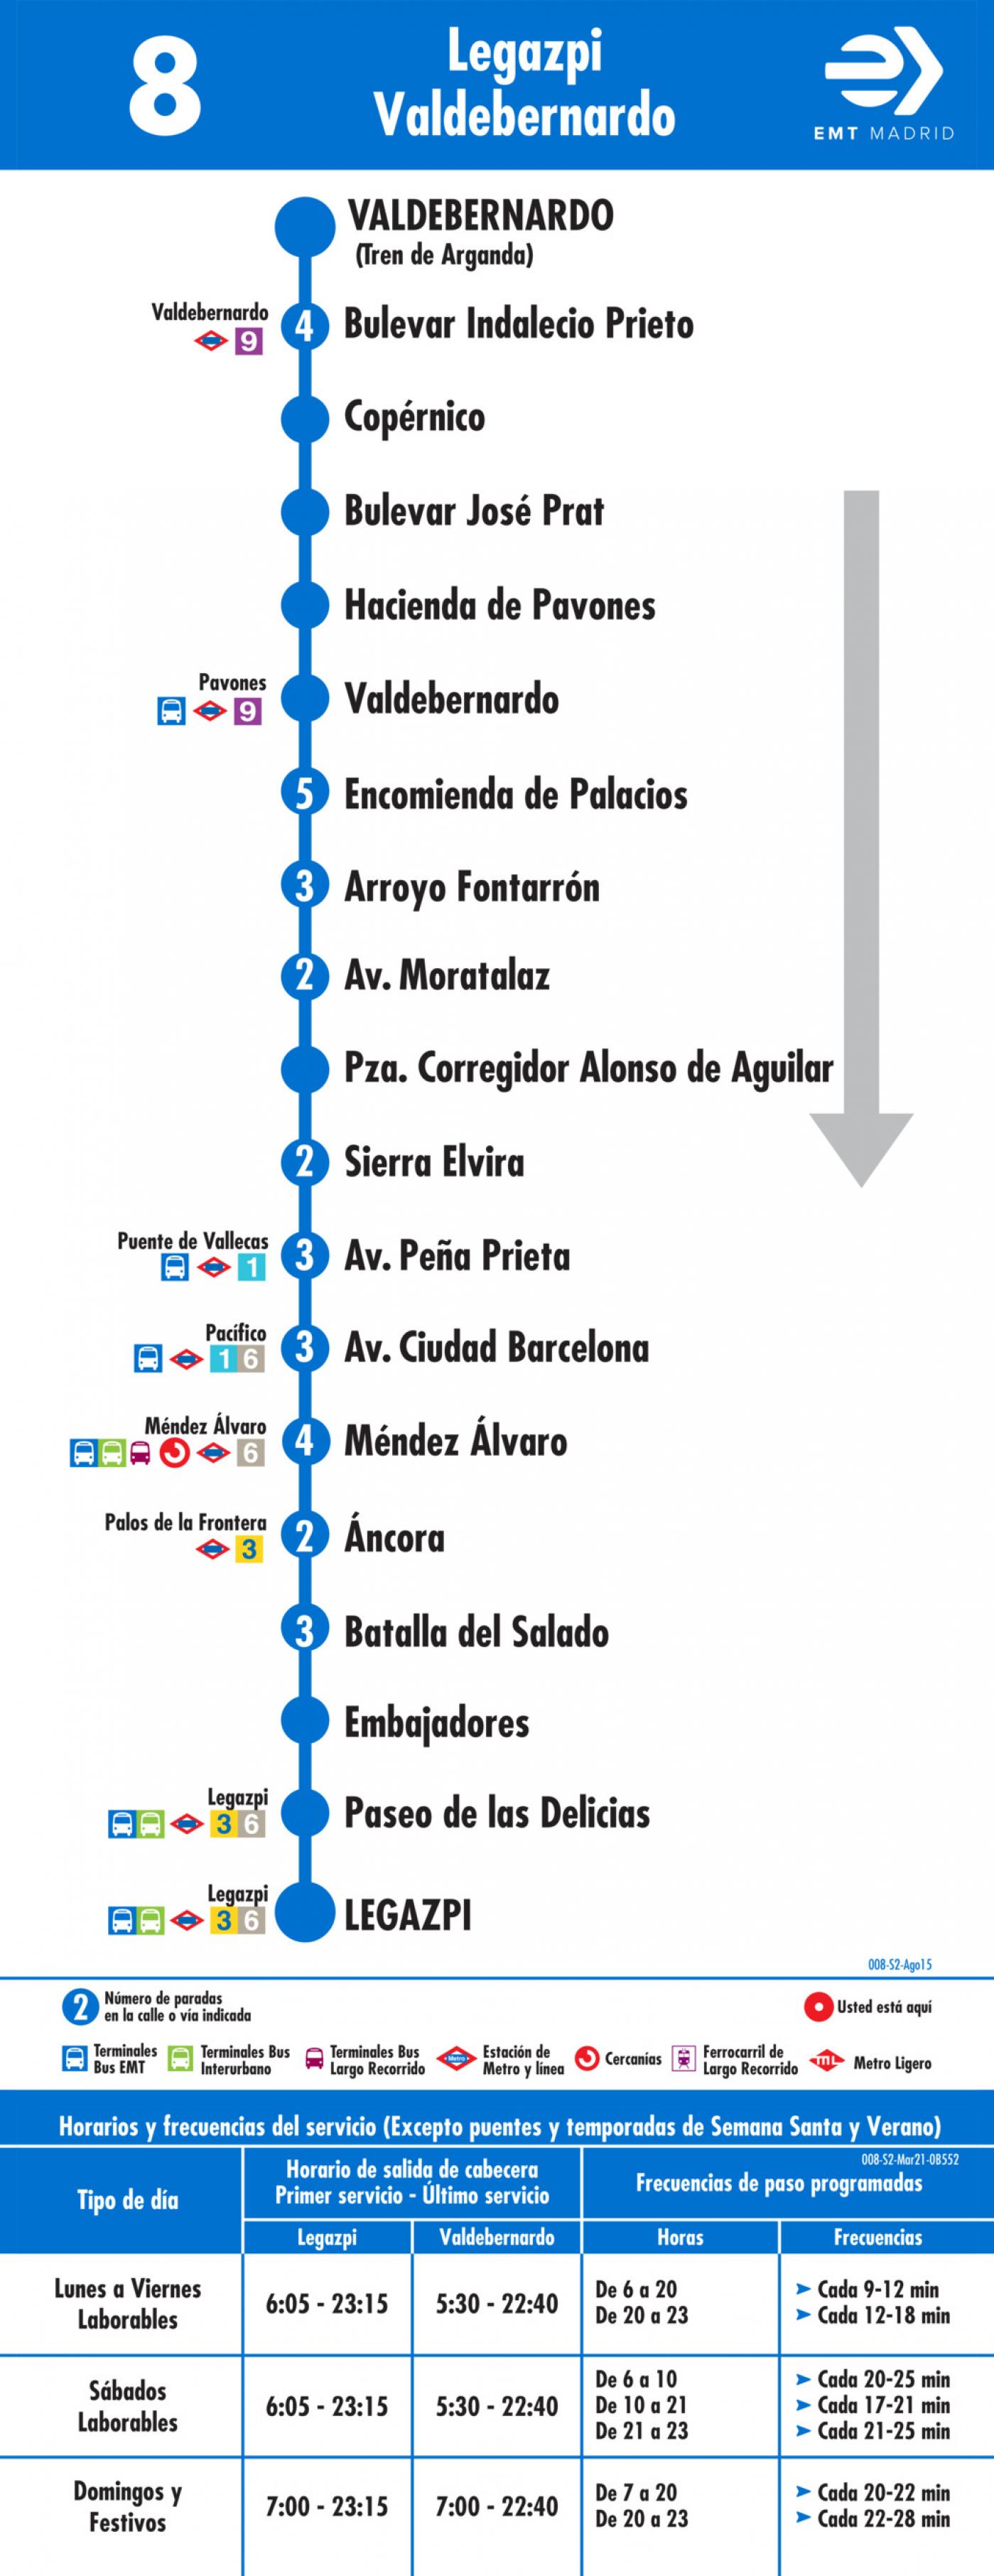 Tabla de horarios y frecuencias de paso en sentido vuelta Línea 8: Plaza de Legazpi - Valdebernardo